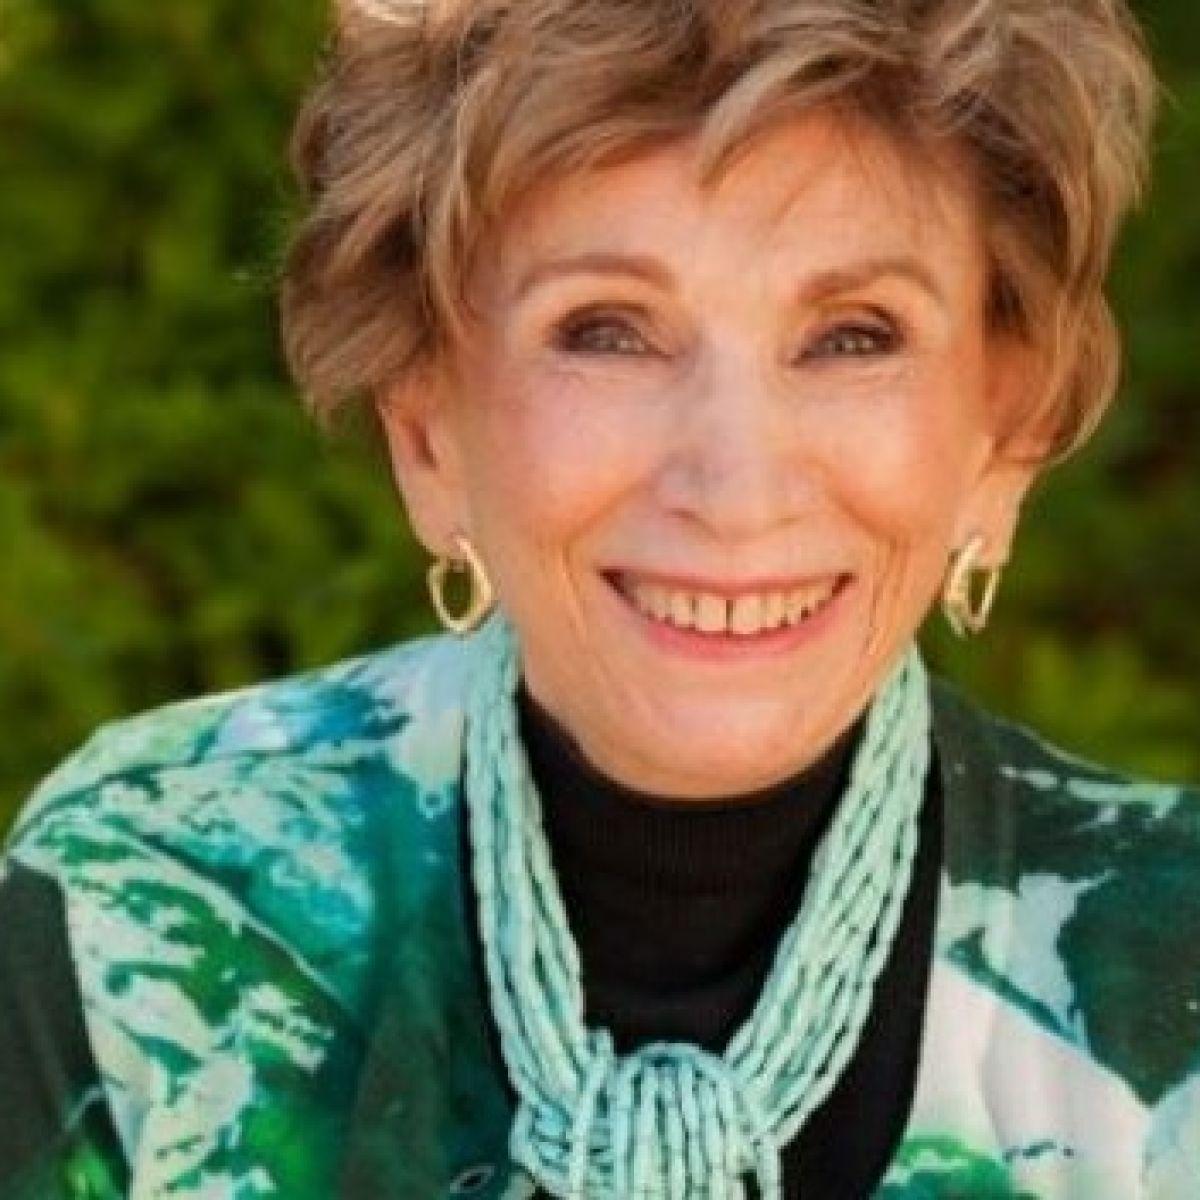 Auschwitz survivor Edith Eger: What I know about life